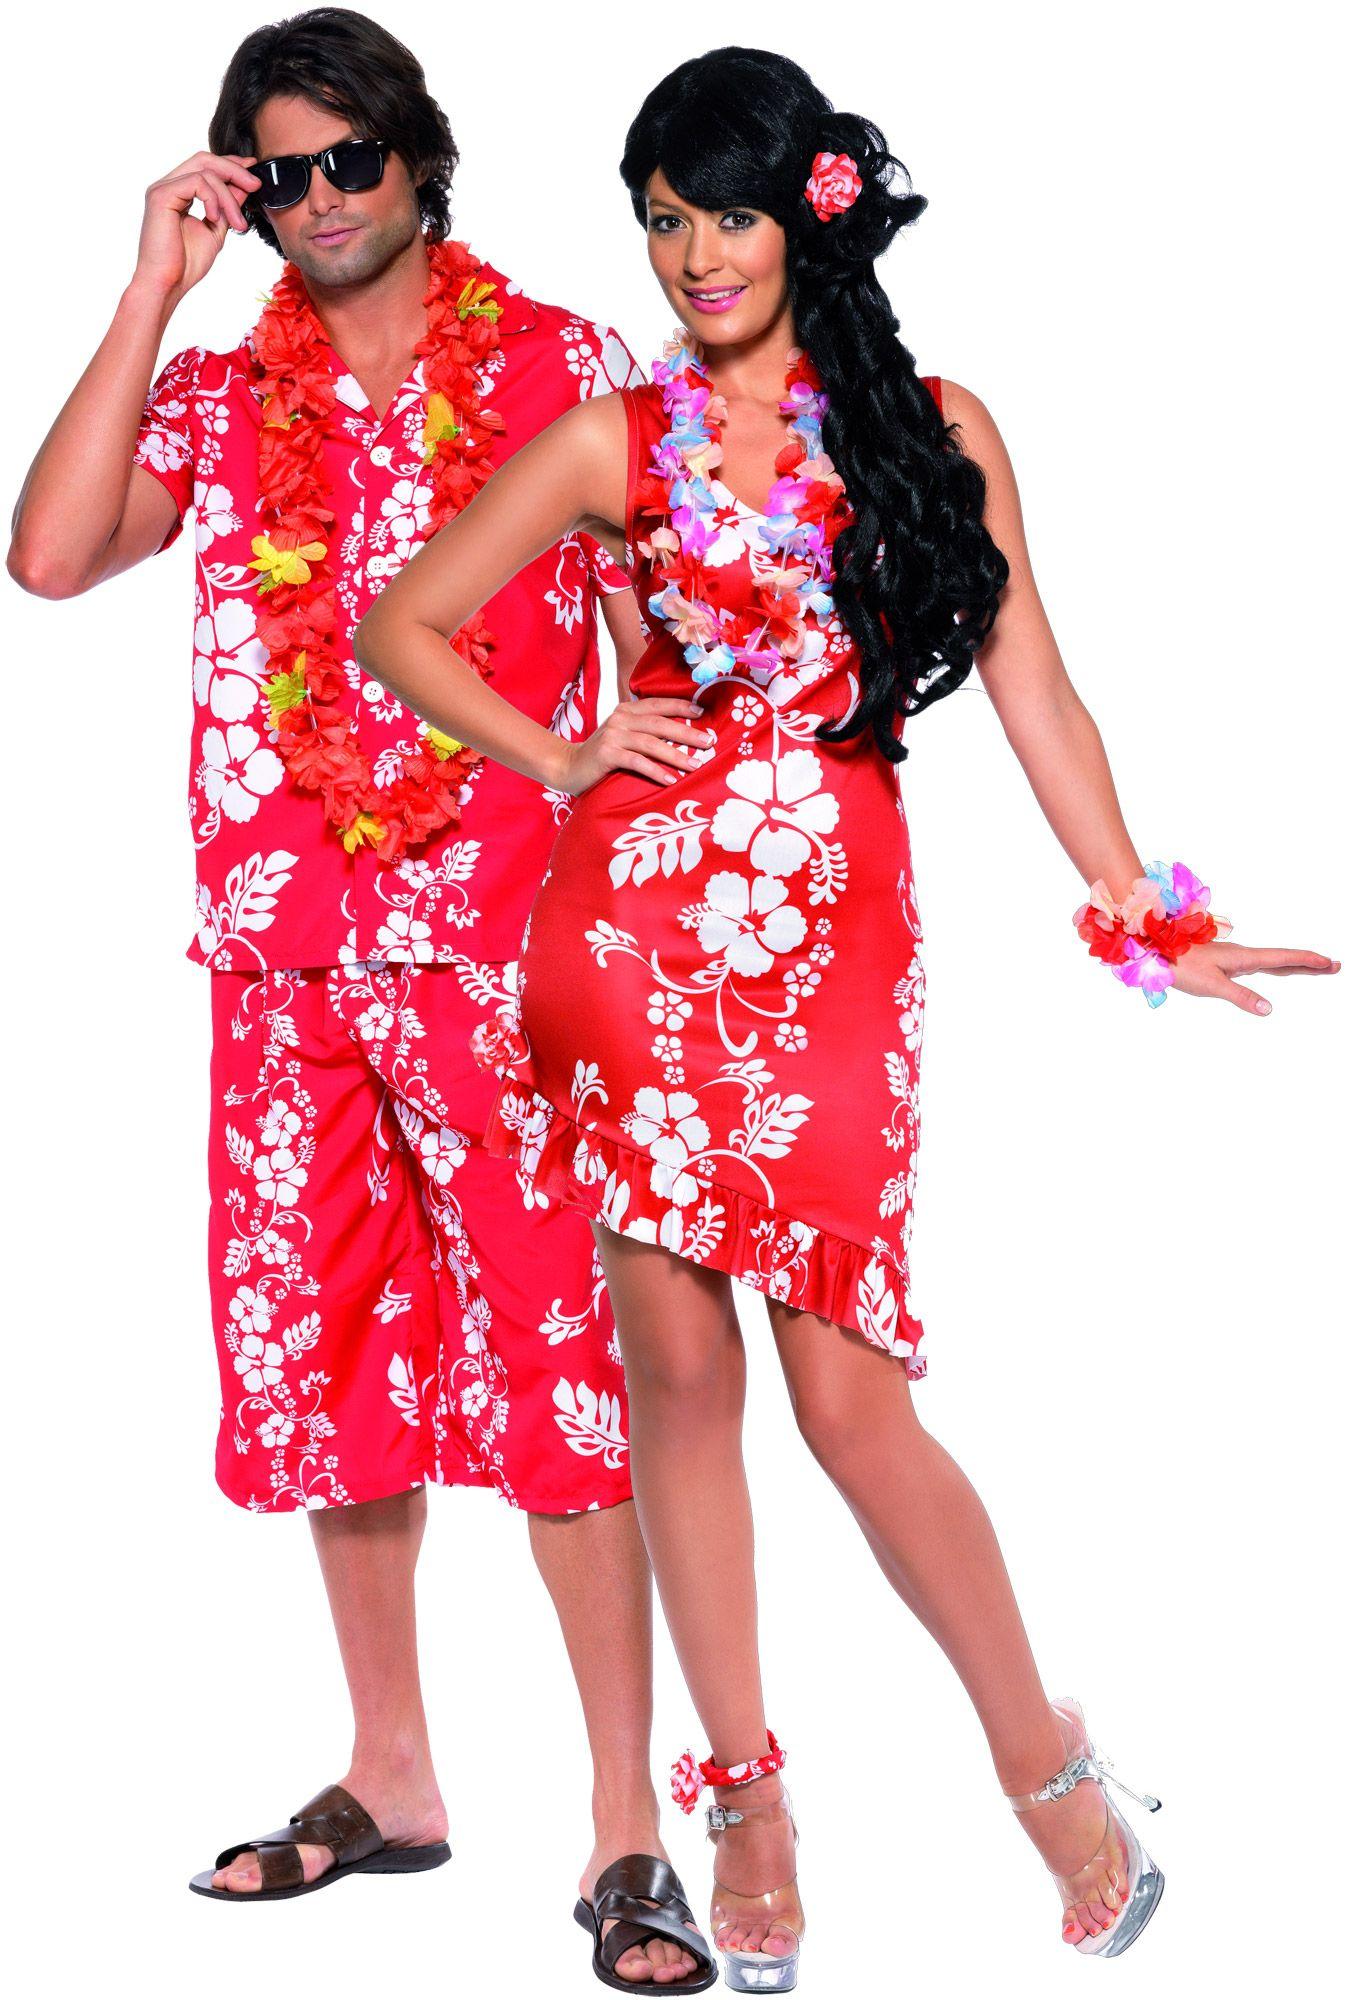 eb4b37b9ccf52 Polynesian Costumes for Women   Main - Adults Costumes - Hawaiian costume  for couples